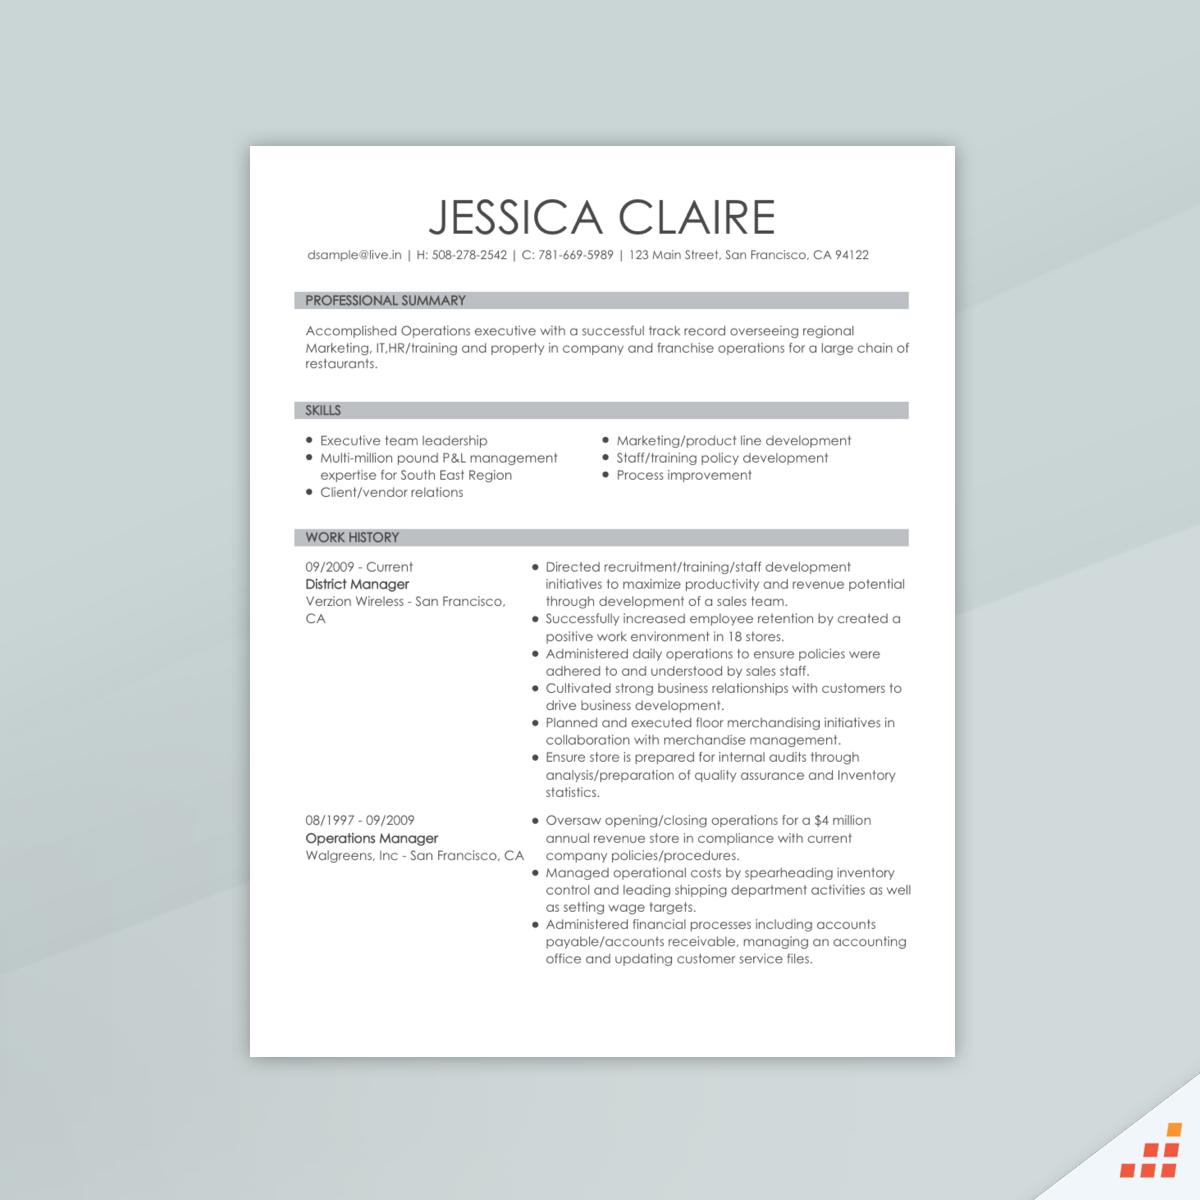 Professional Resume Template Resume Advice Resume Writing Tips Resume Tips